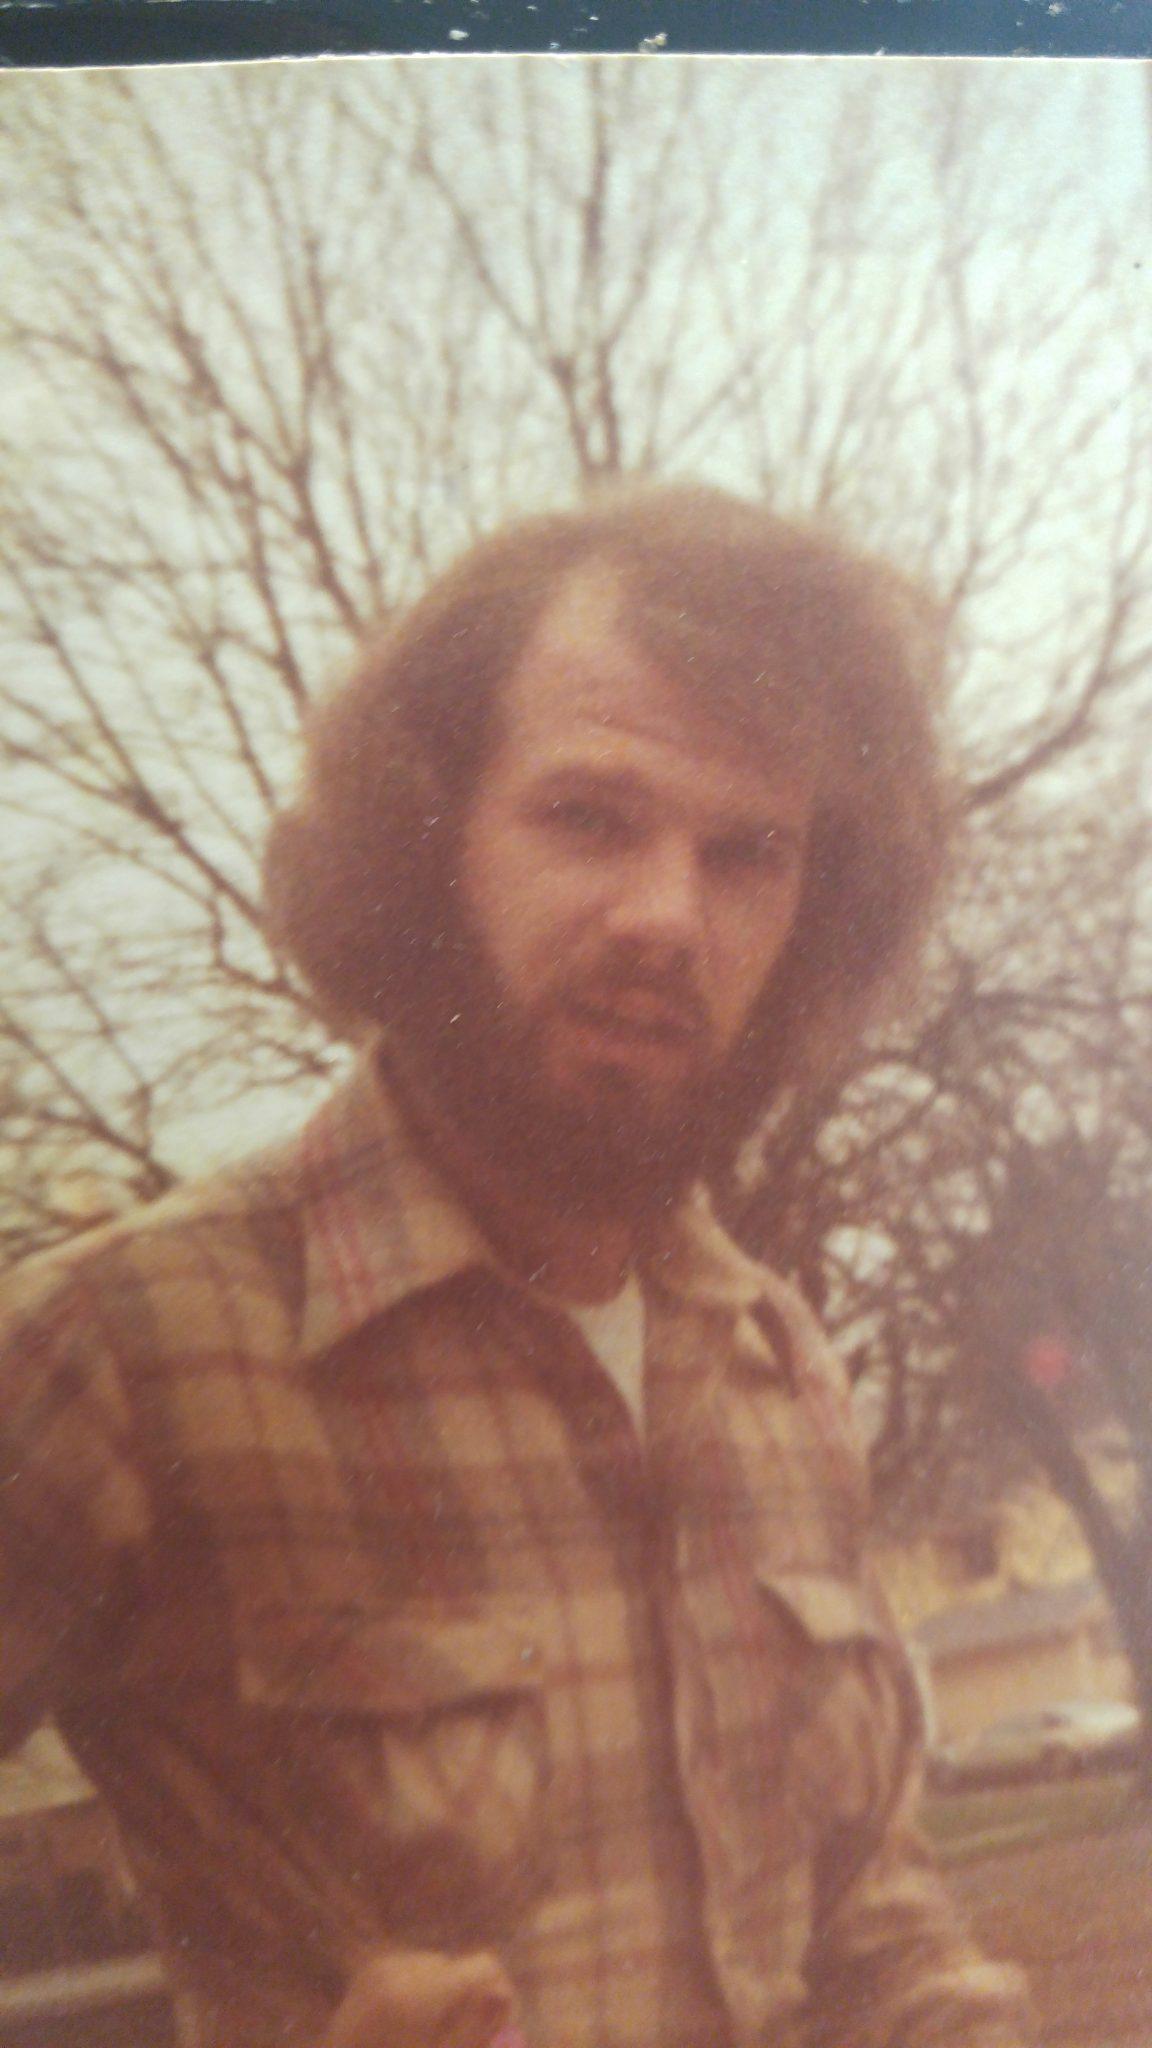 70's wild man! Go in peace Dad!